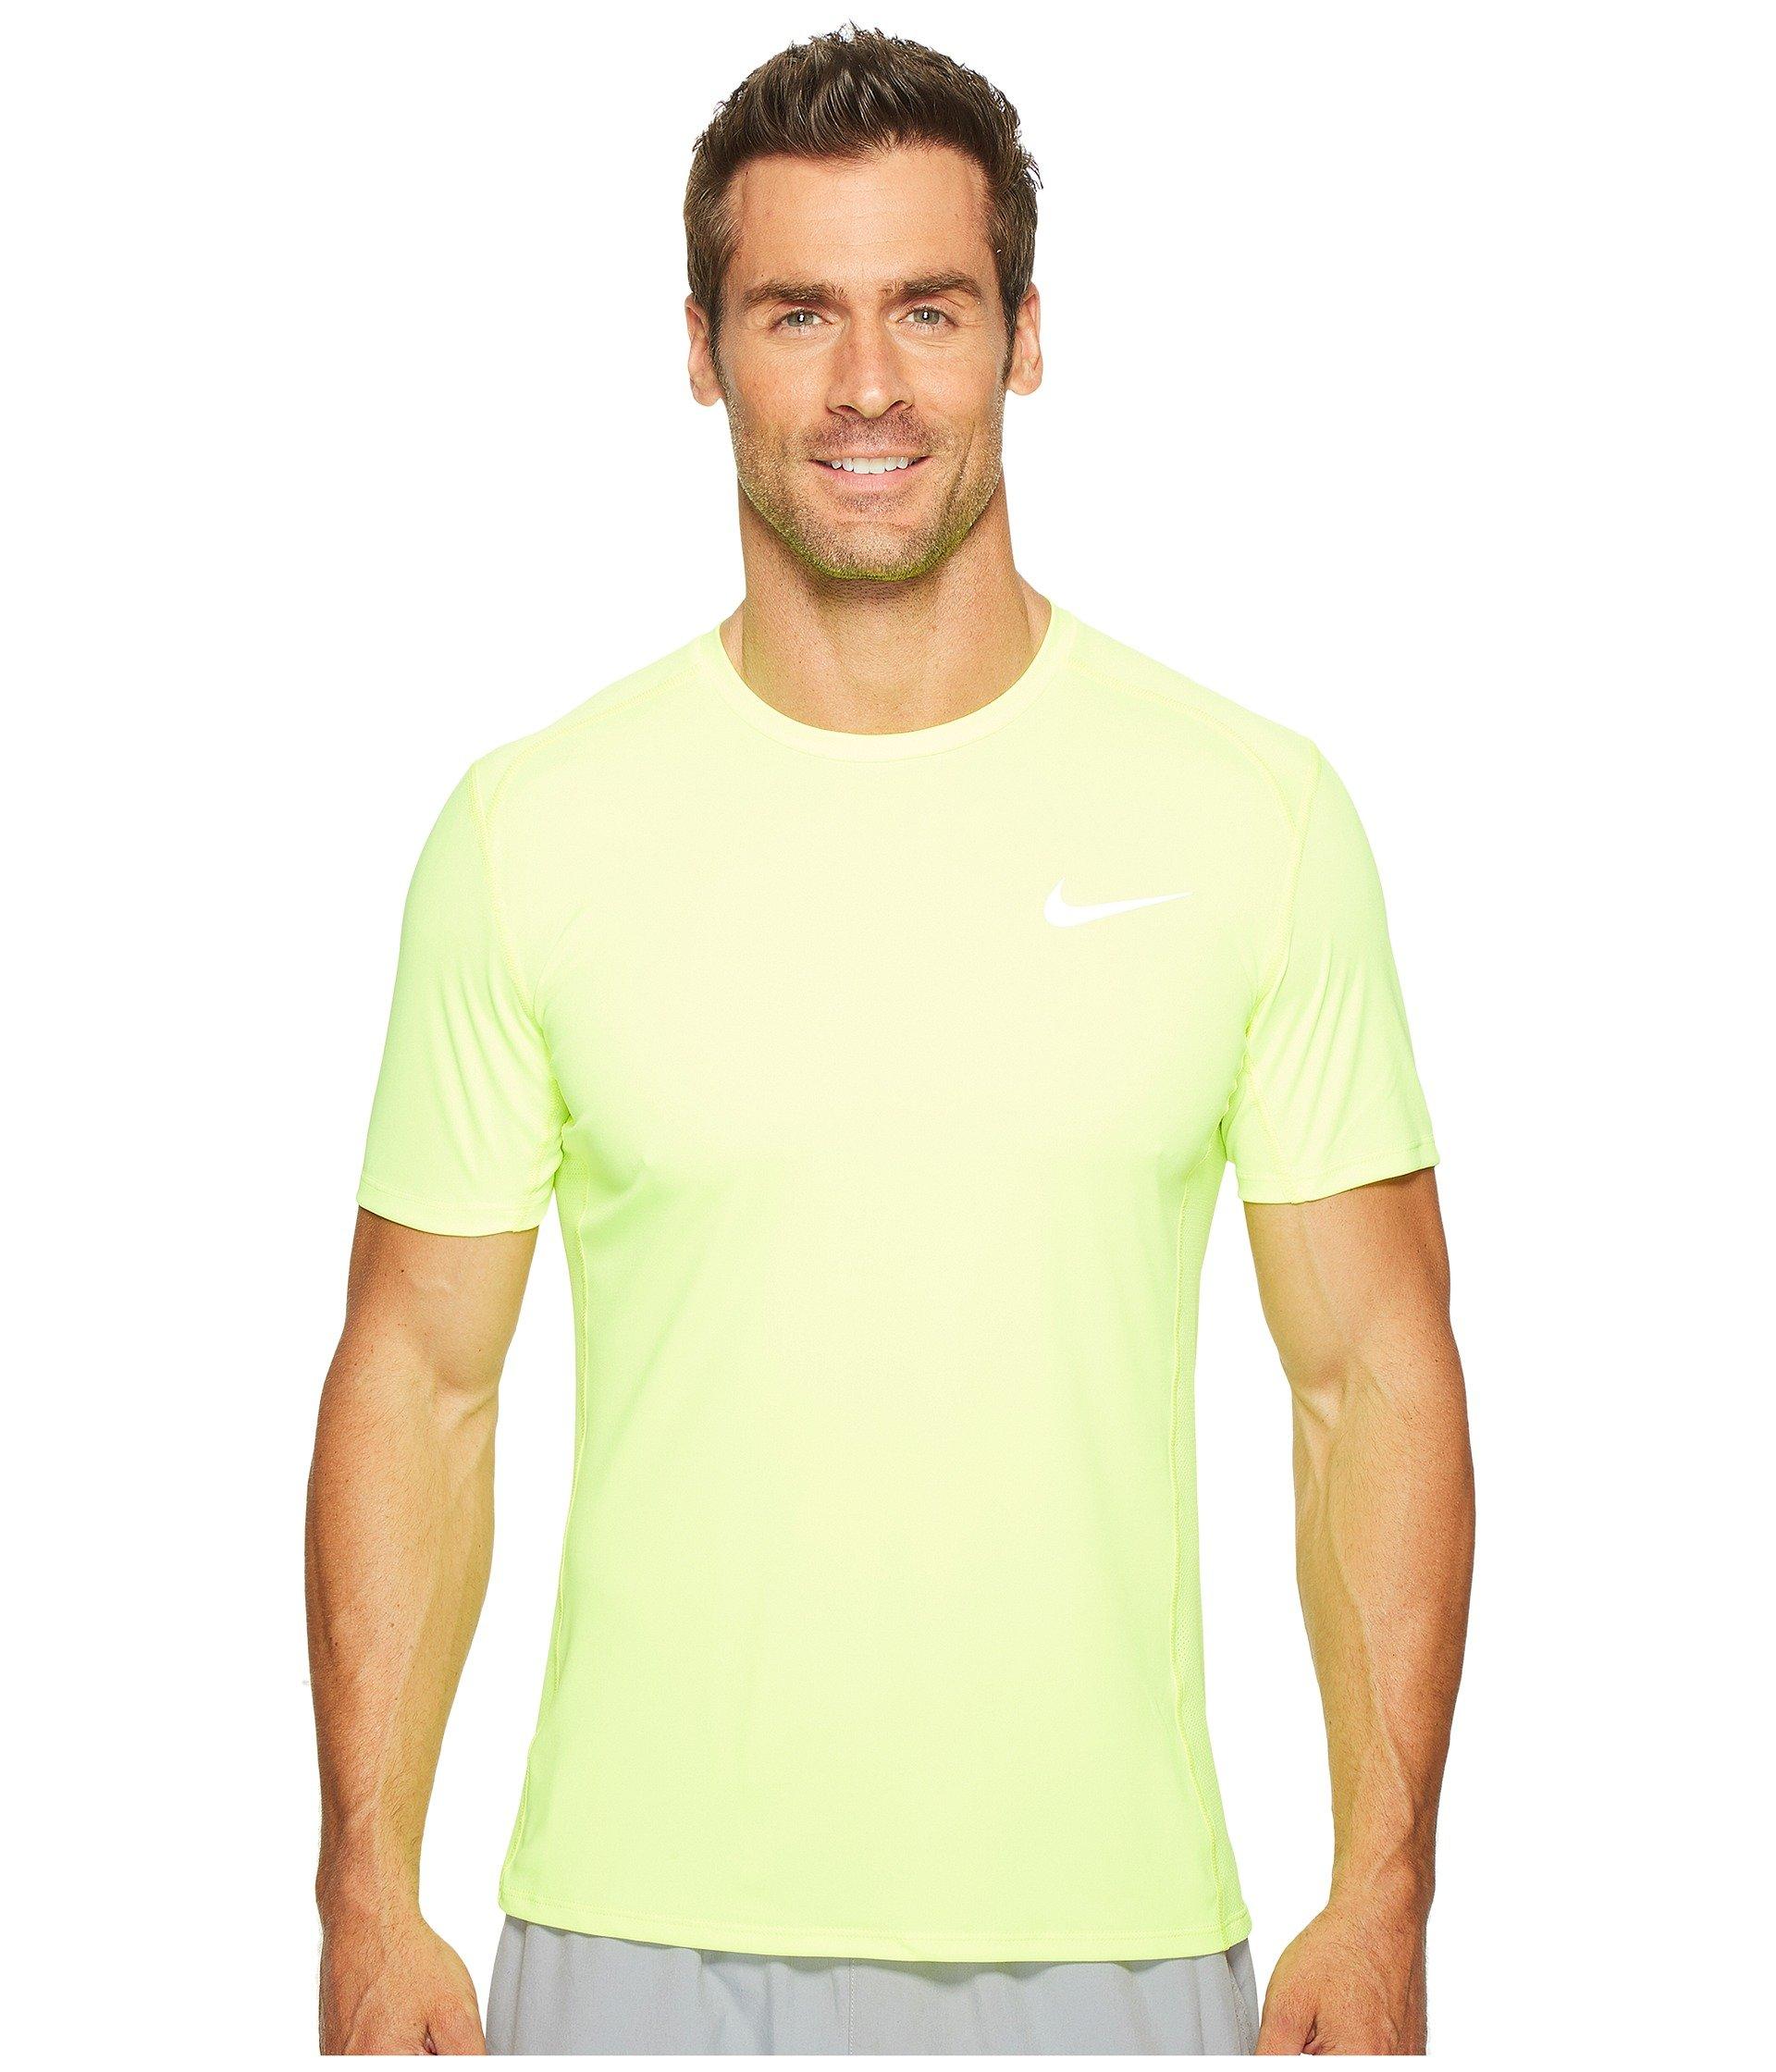 huge discount 960a8 2e0ce Nike Dry Miler Short Sleeve Running Top, Volt Volt